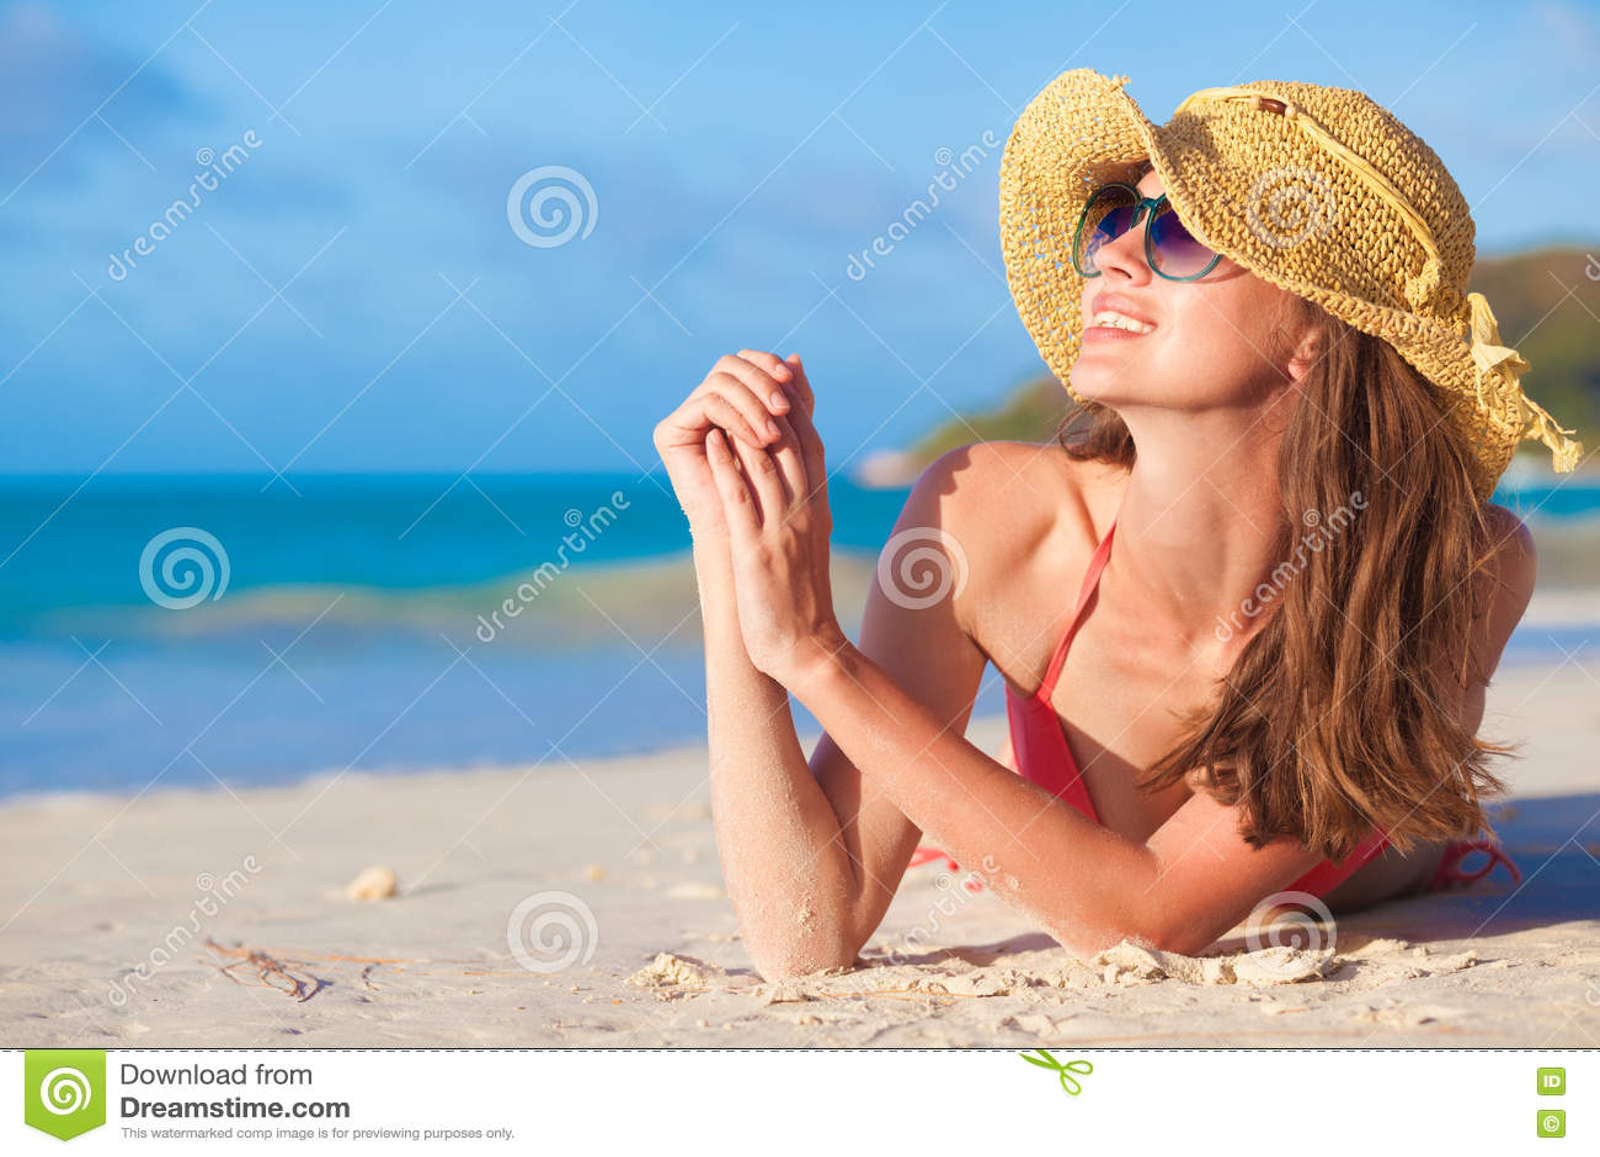 Portrait of pretty long haired woman in bikini having fun at tropical beach. Praslin, Seychelles